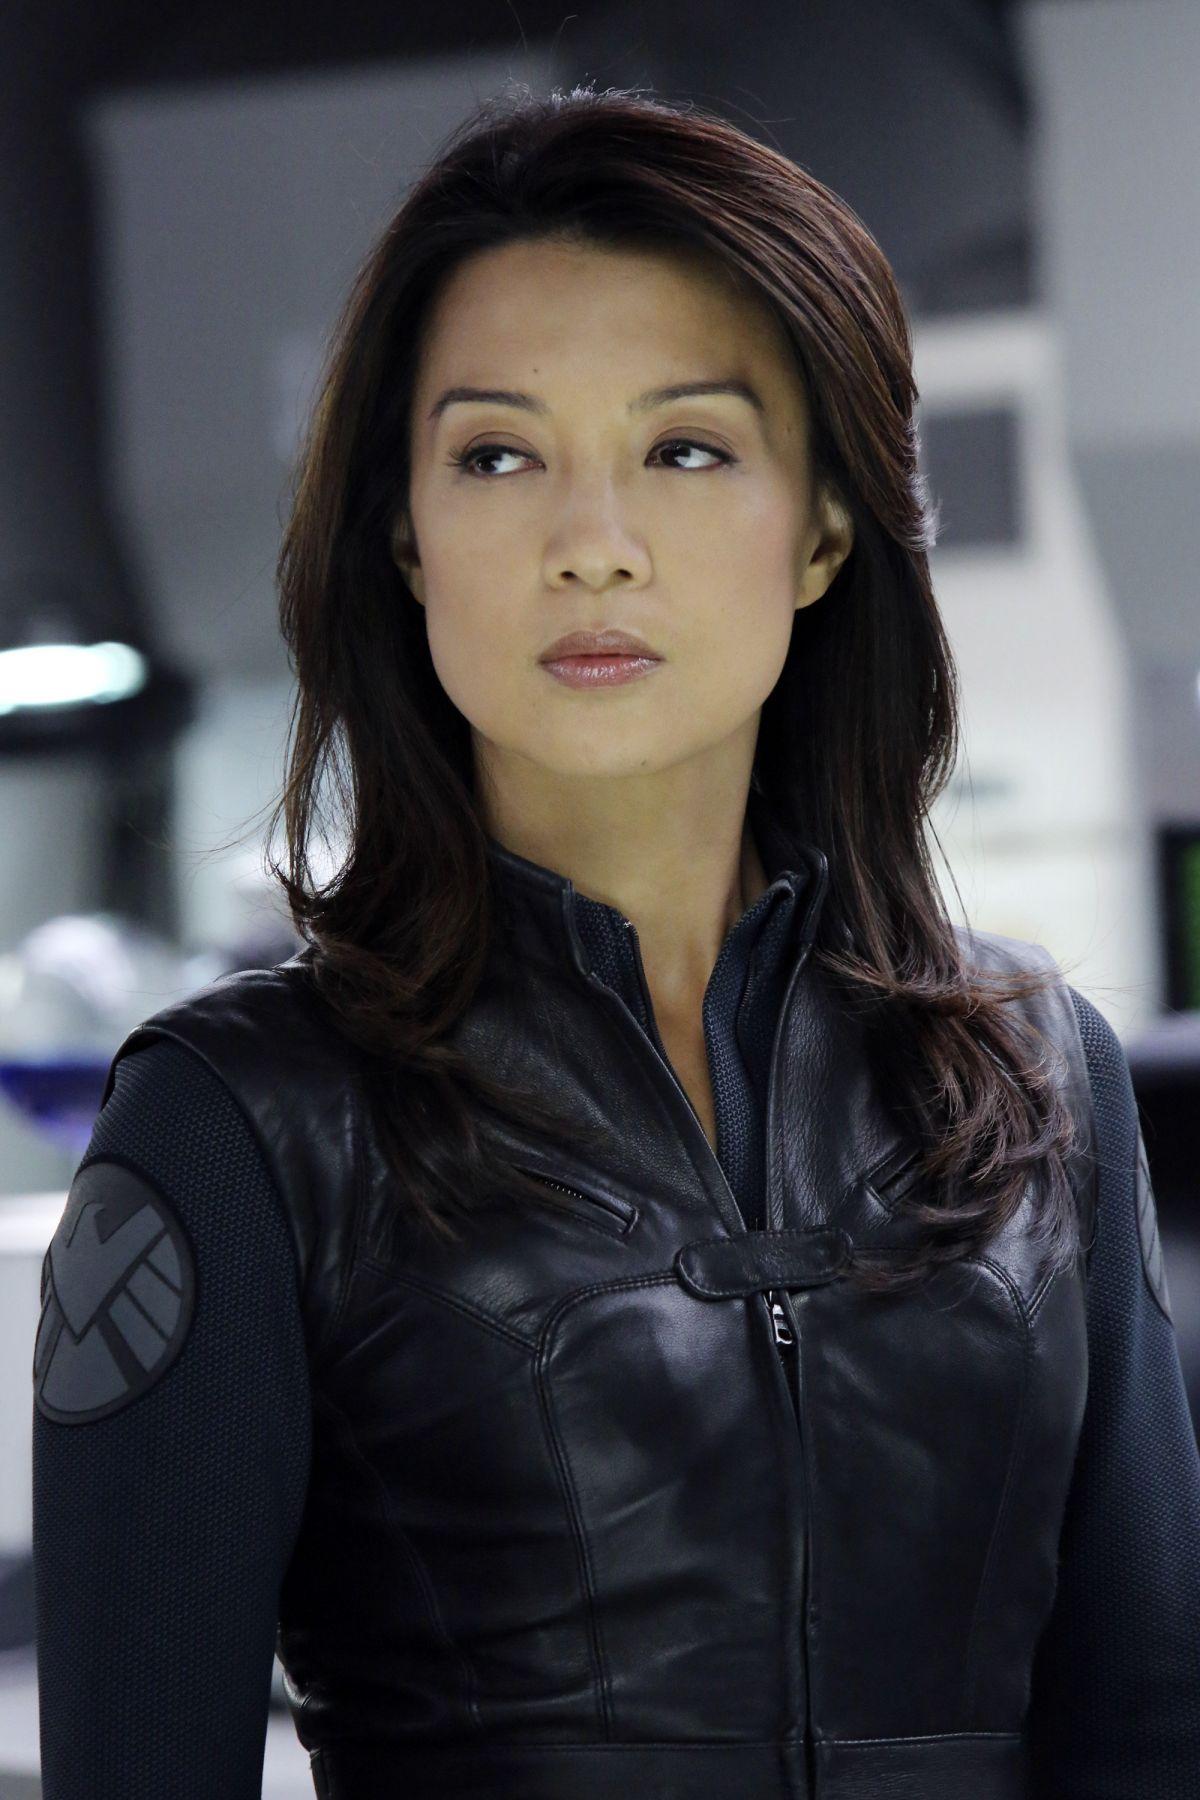 ming-na-wen-at-marvel-s-agents-of-s.h.i.e.l.d.-ep.-108_1